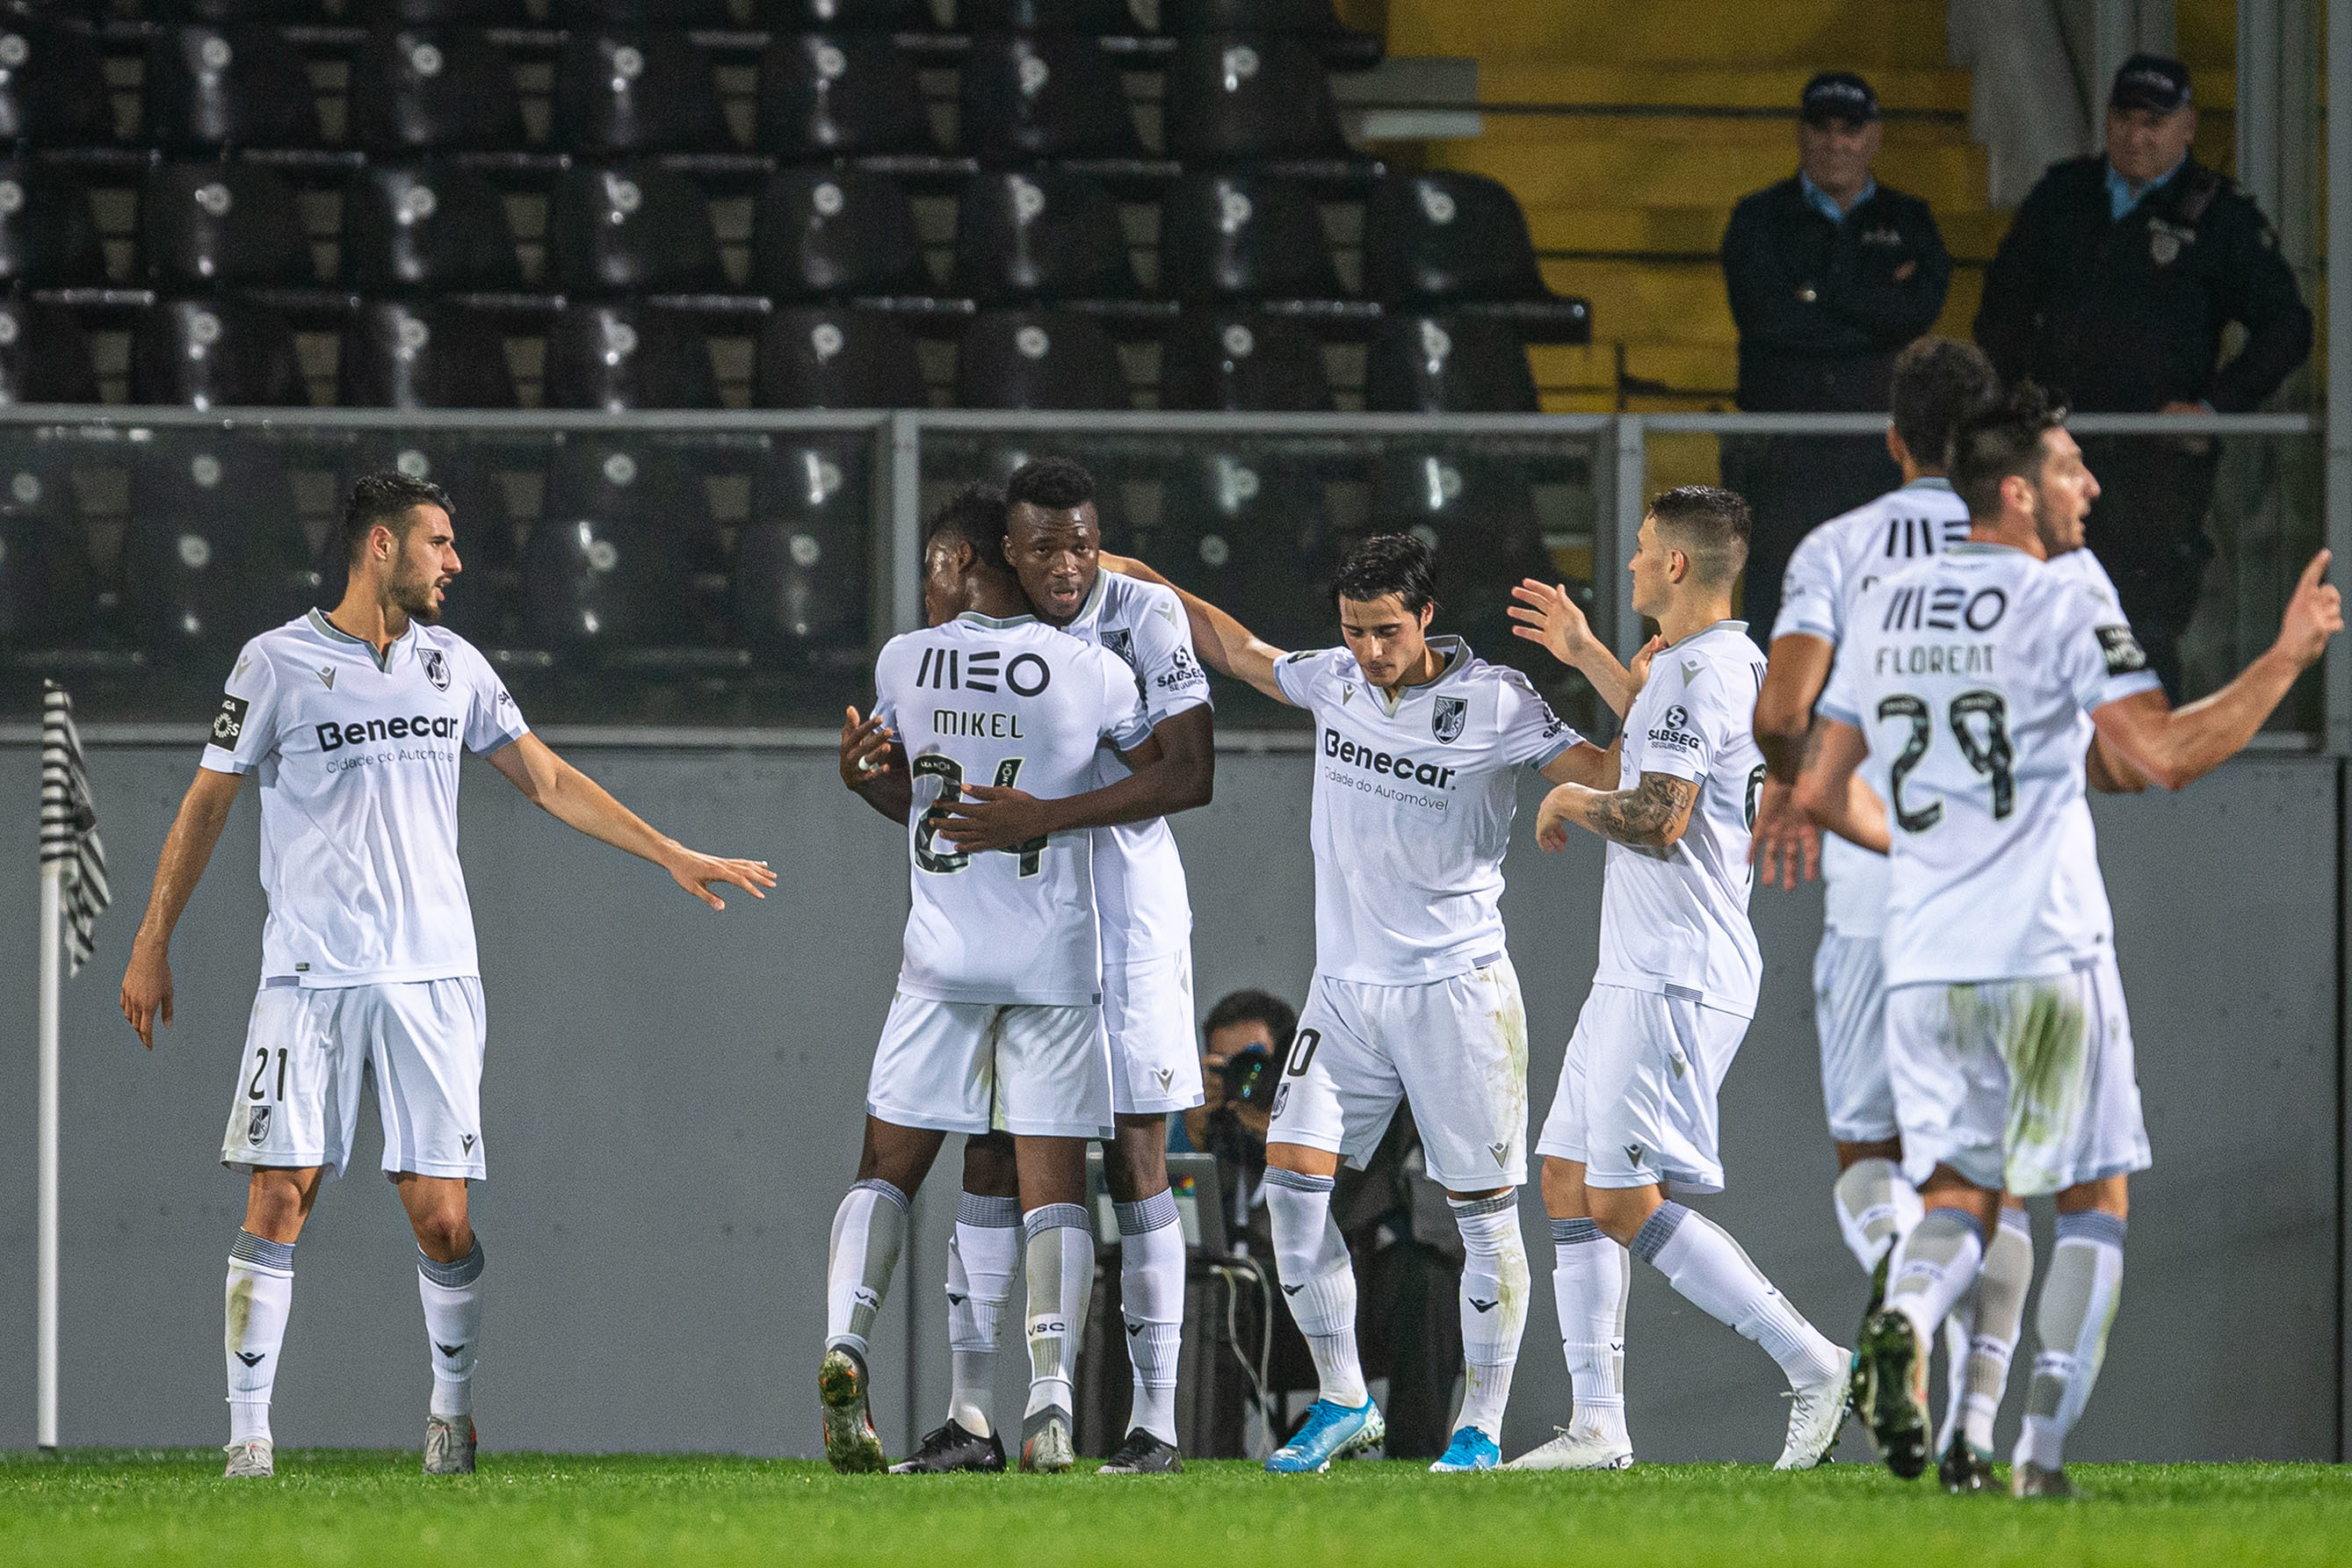 Acompanhe o Eintracht Frankfurt - Vitória SC AO MINUTO